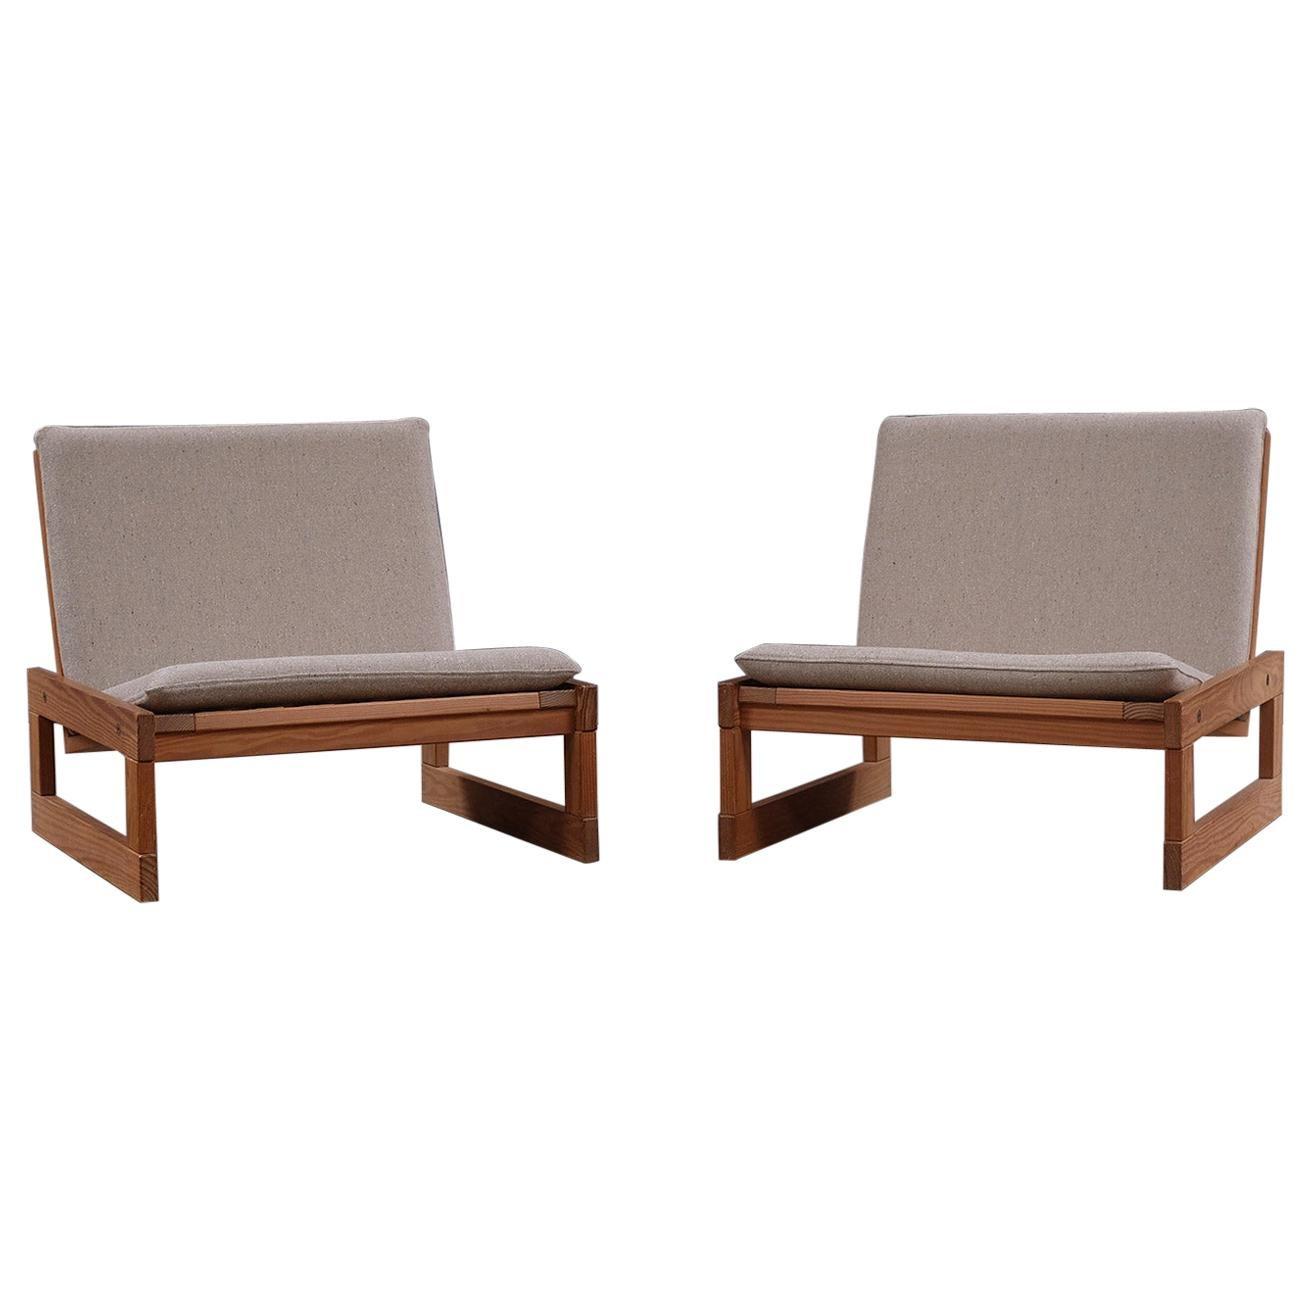 Scandinavian Modern Low Danish Oregon Pine Lounge Chairs, Mid 20th Century